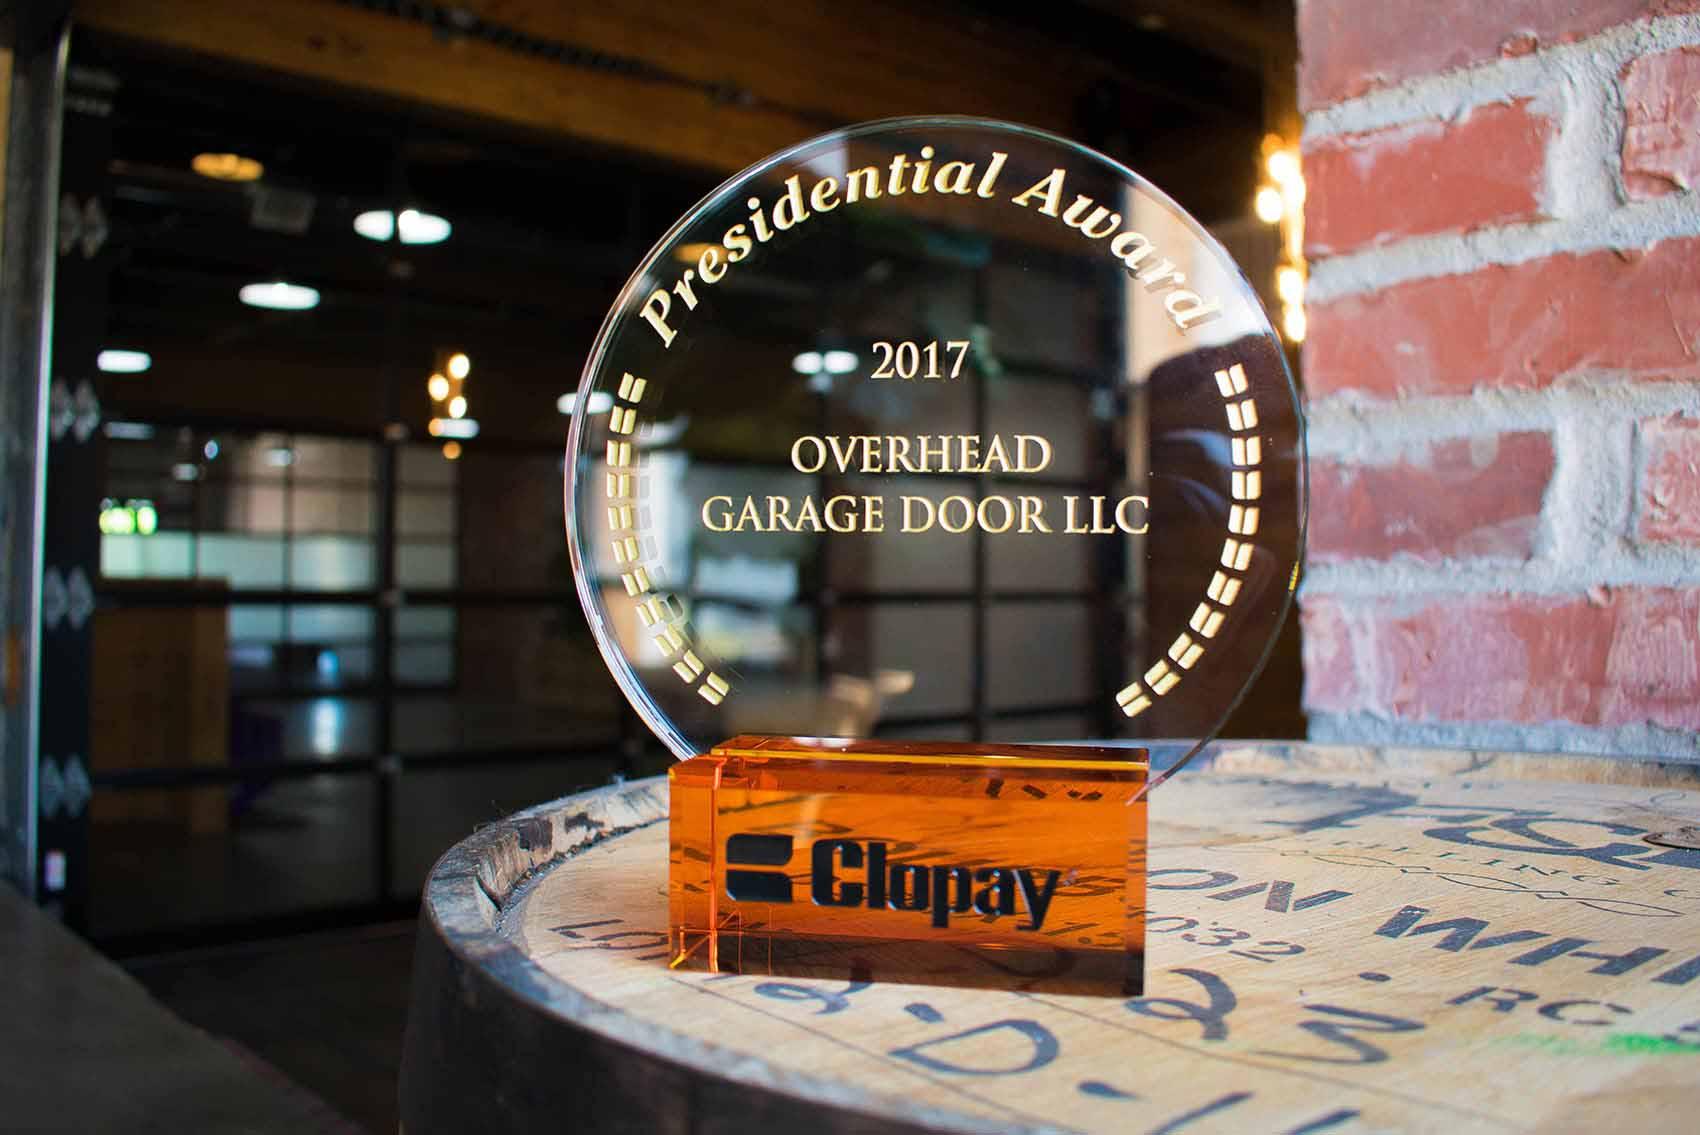 Overhead Garage Door LLC Clopay Presidential Award Winner